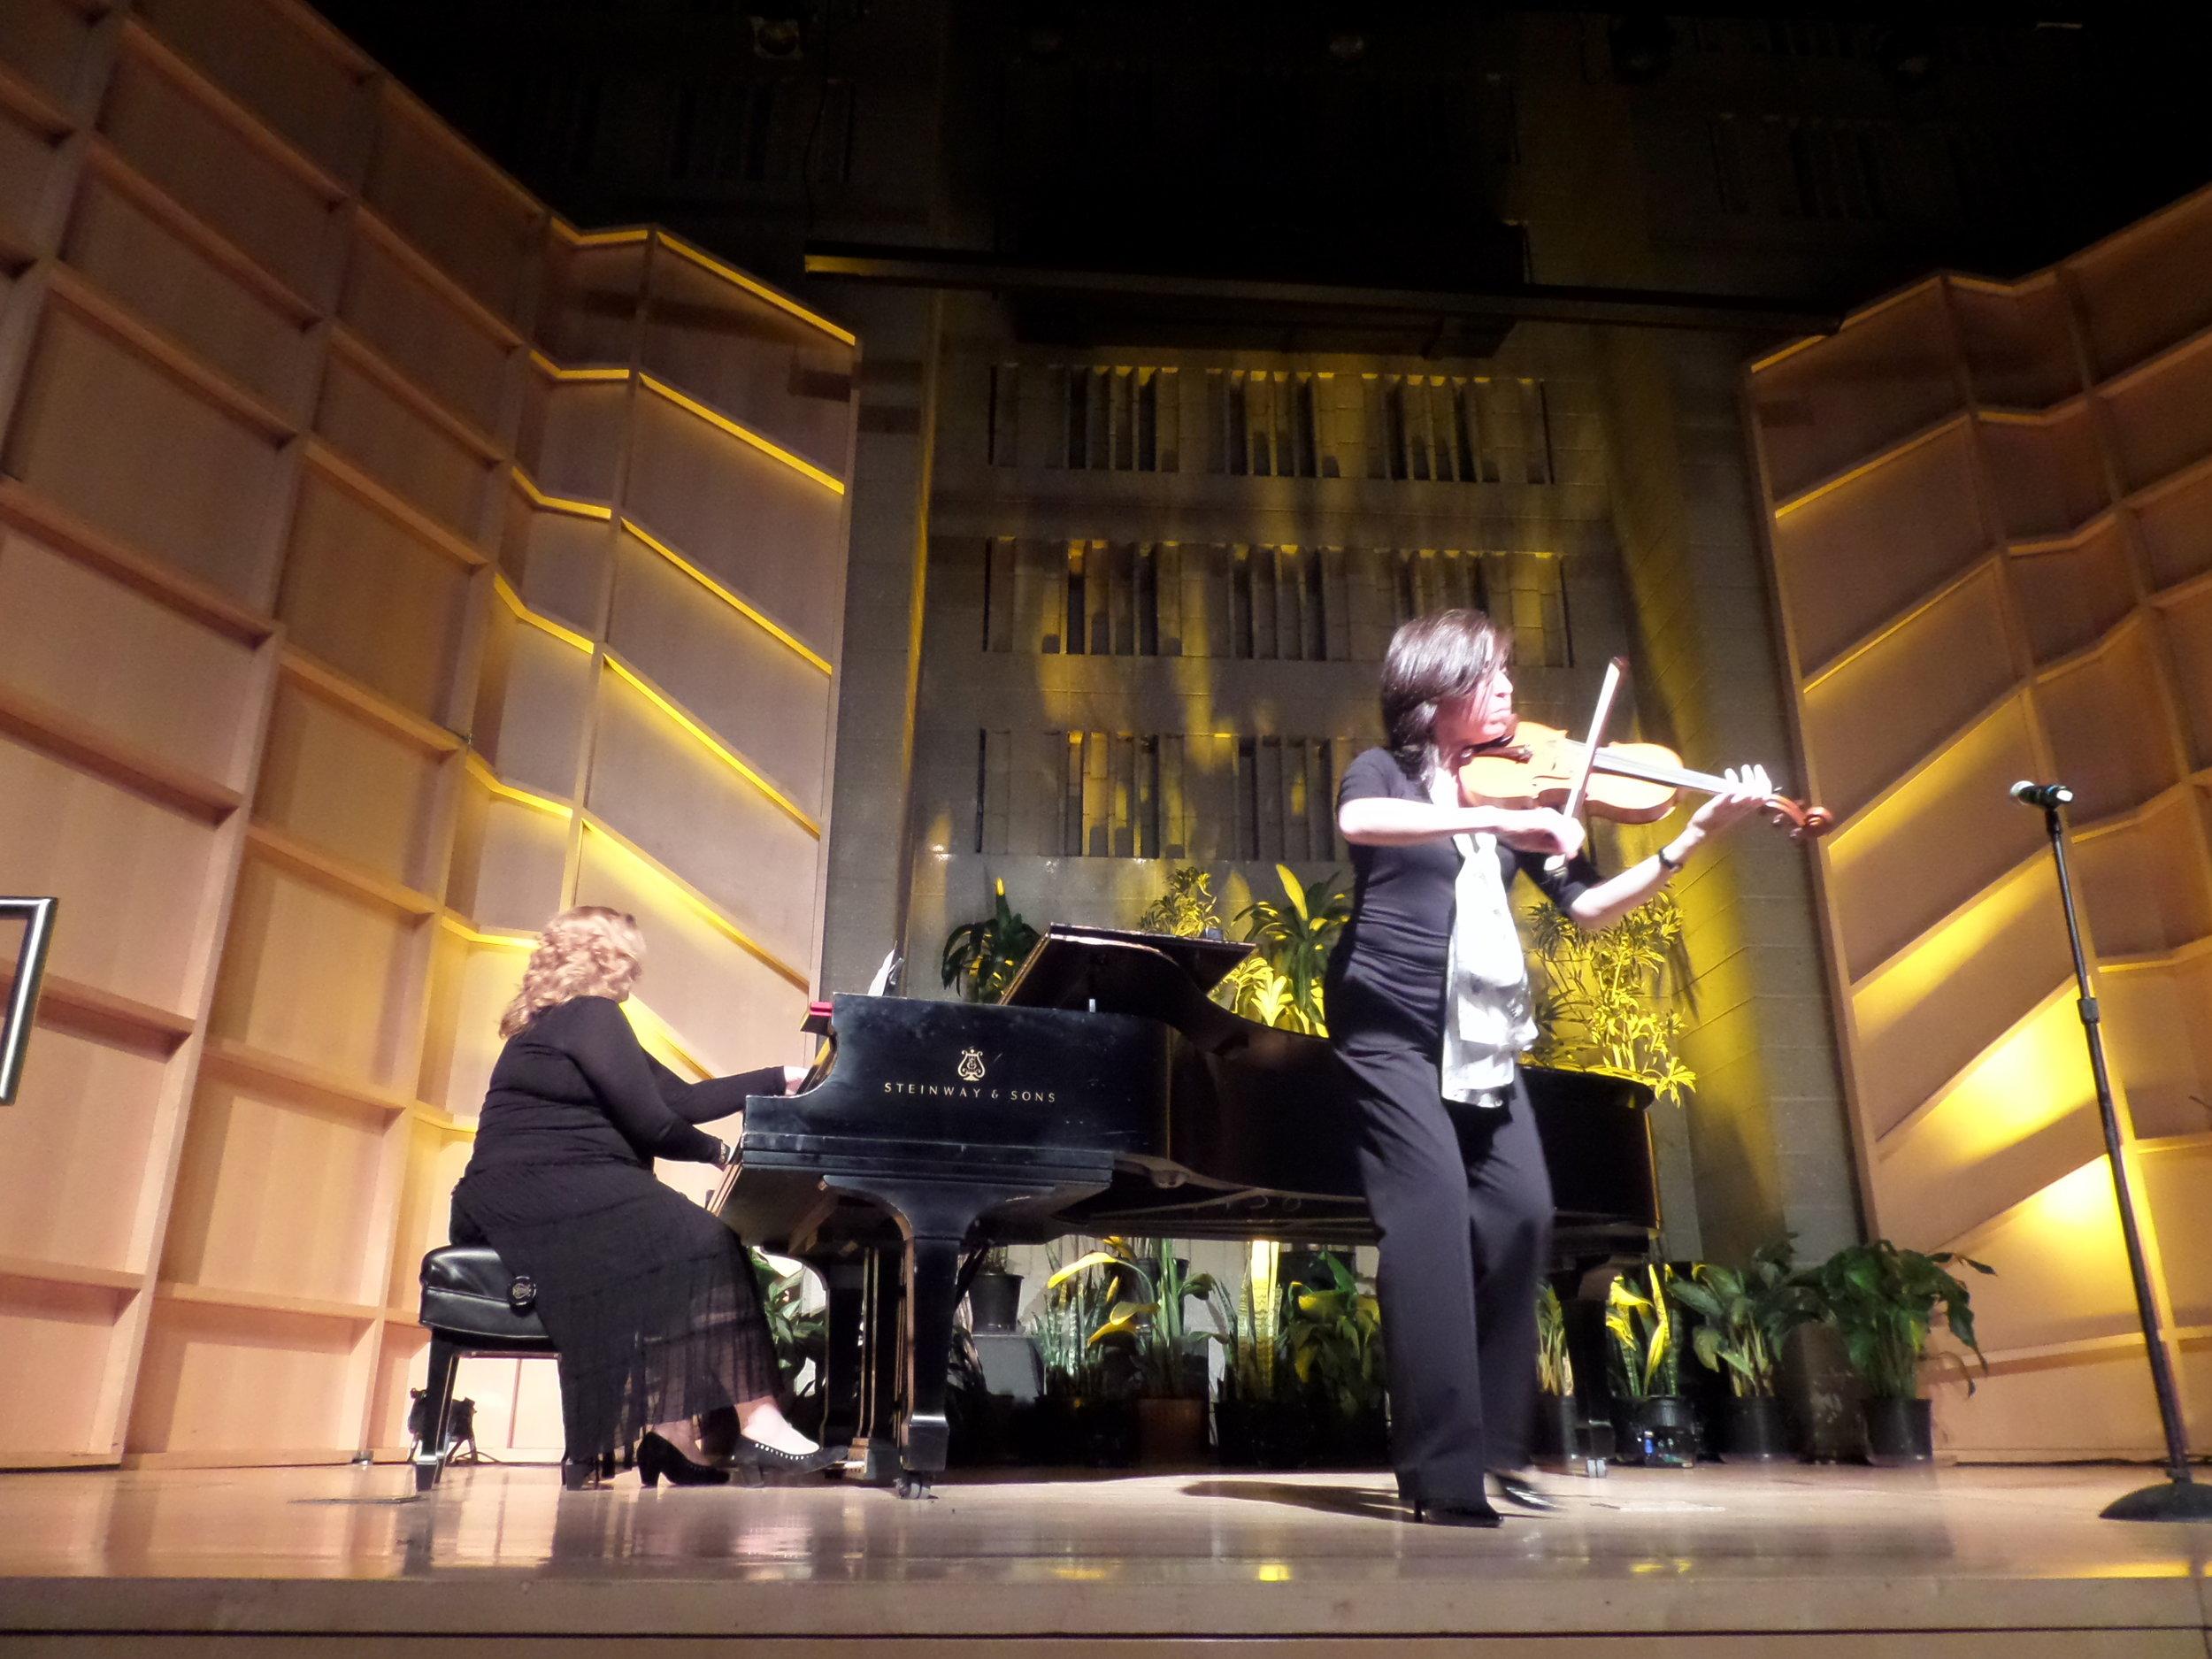 SKY CARAVAN - Milena Davidowicz, Violinist & Elena Panova, Pianist perform before the film  THE WHISPERER by Andrea Odezynska.